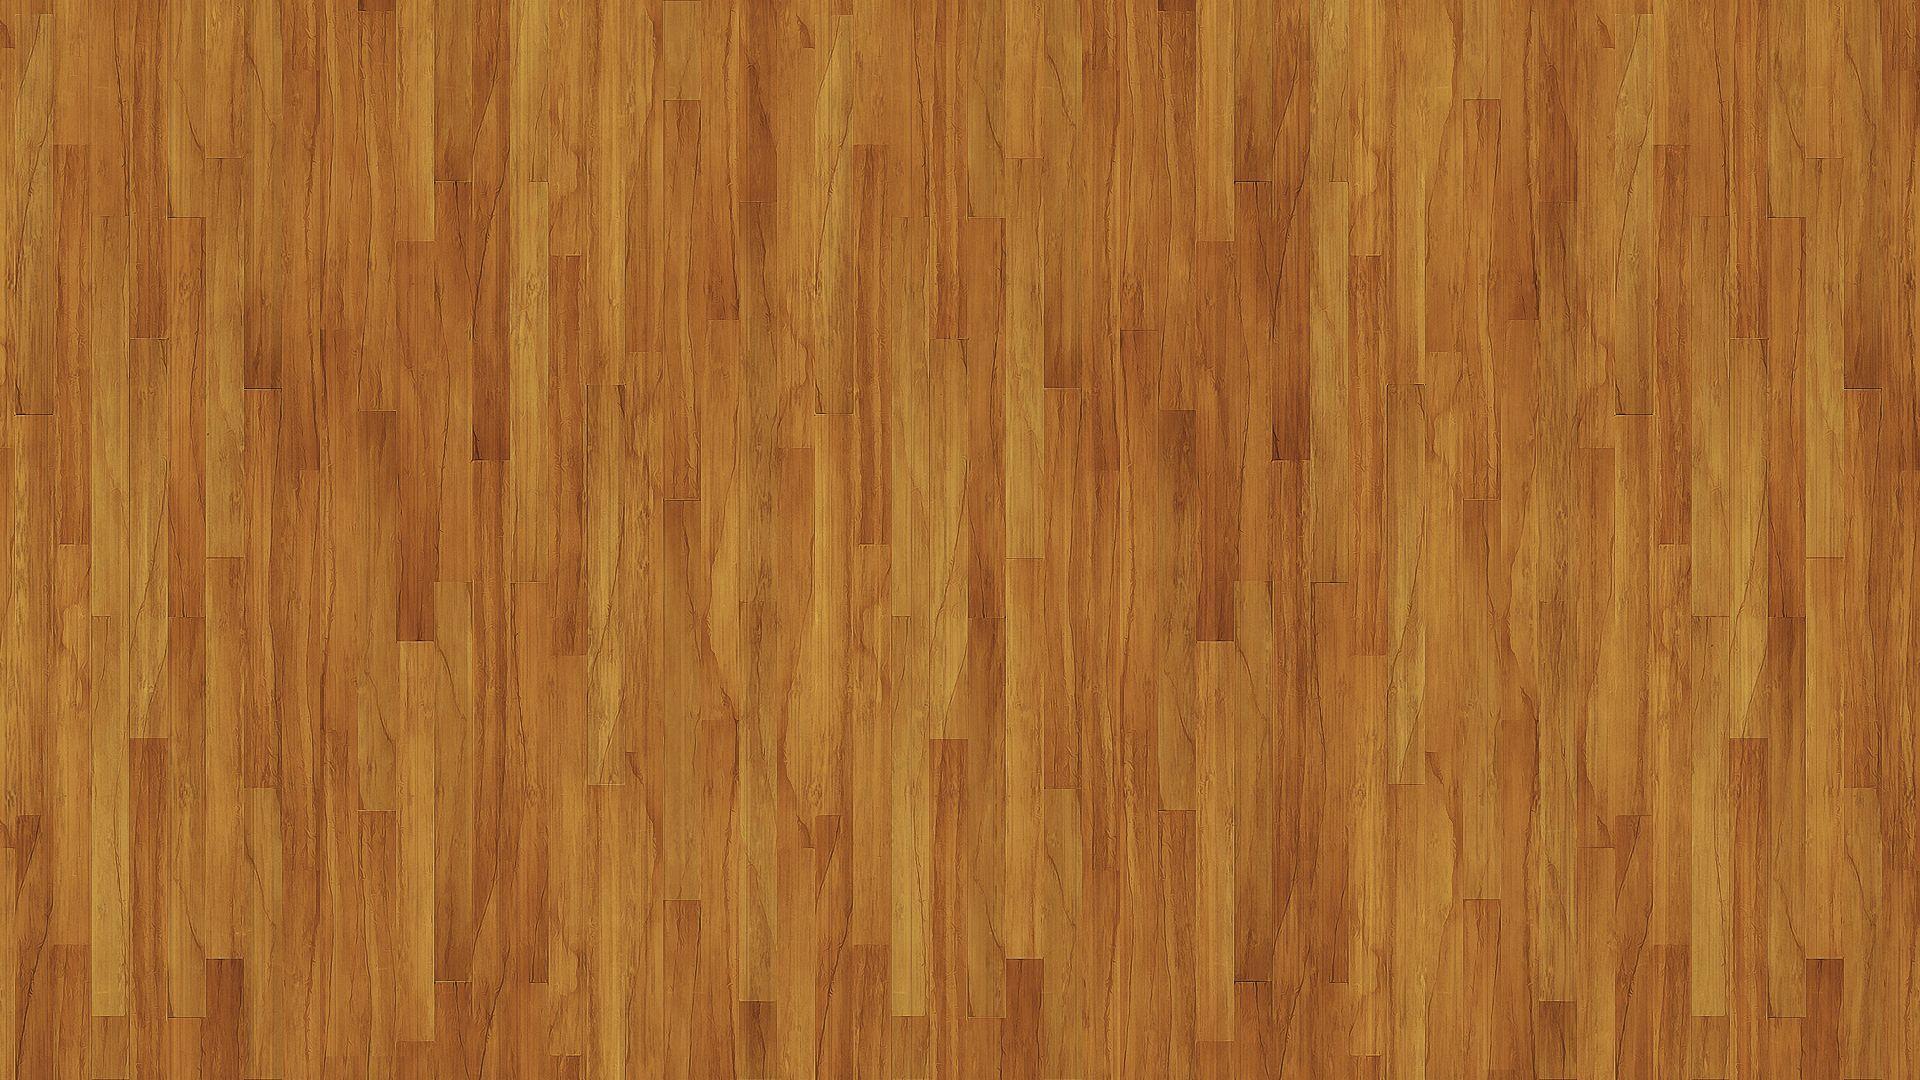 Wood flooring wallpaper wallpapersafari for Floating wood floor